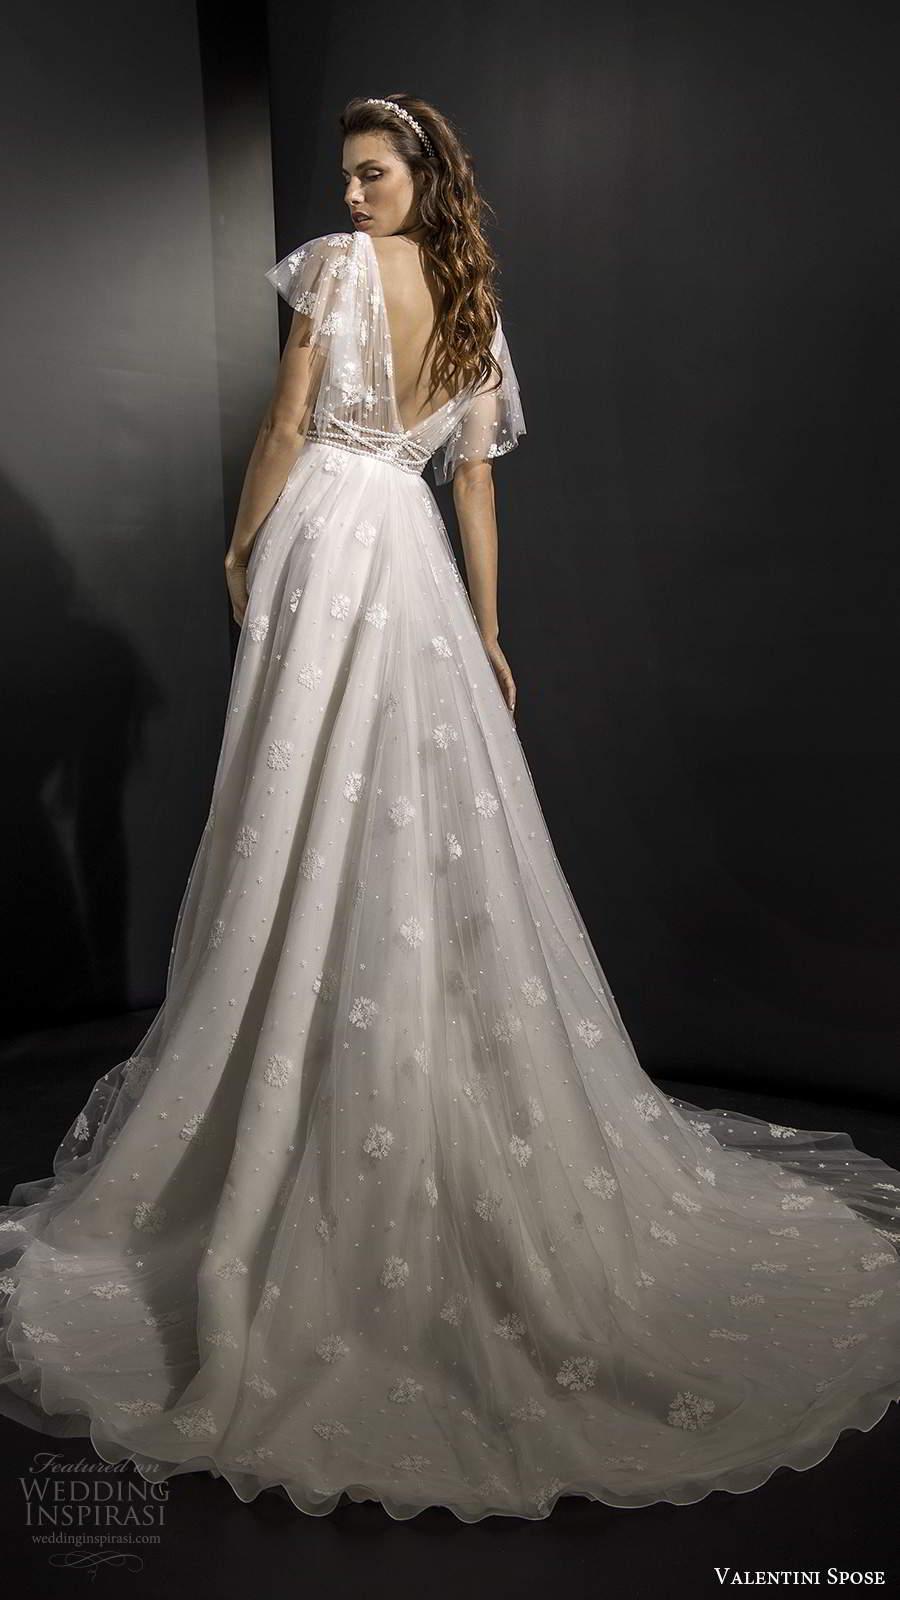 valentini spose fall 2020 bridal illusion flutter sleeves plunging v neckline ruched bodice fully embellished a line ball gown wedding dress v back chapel train  (9) bv